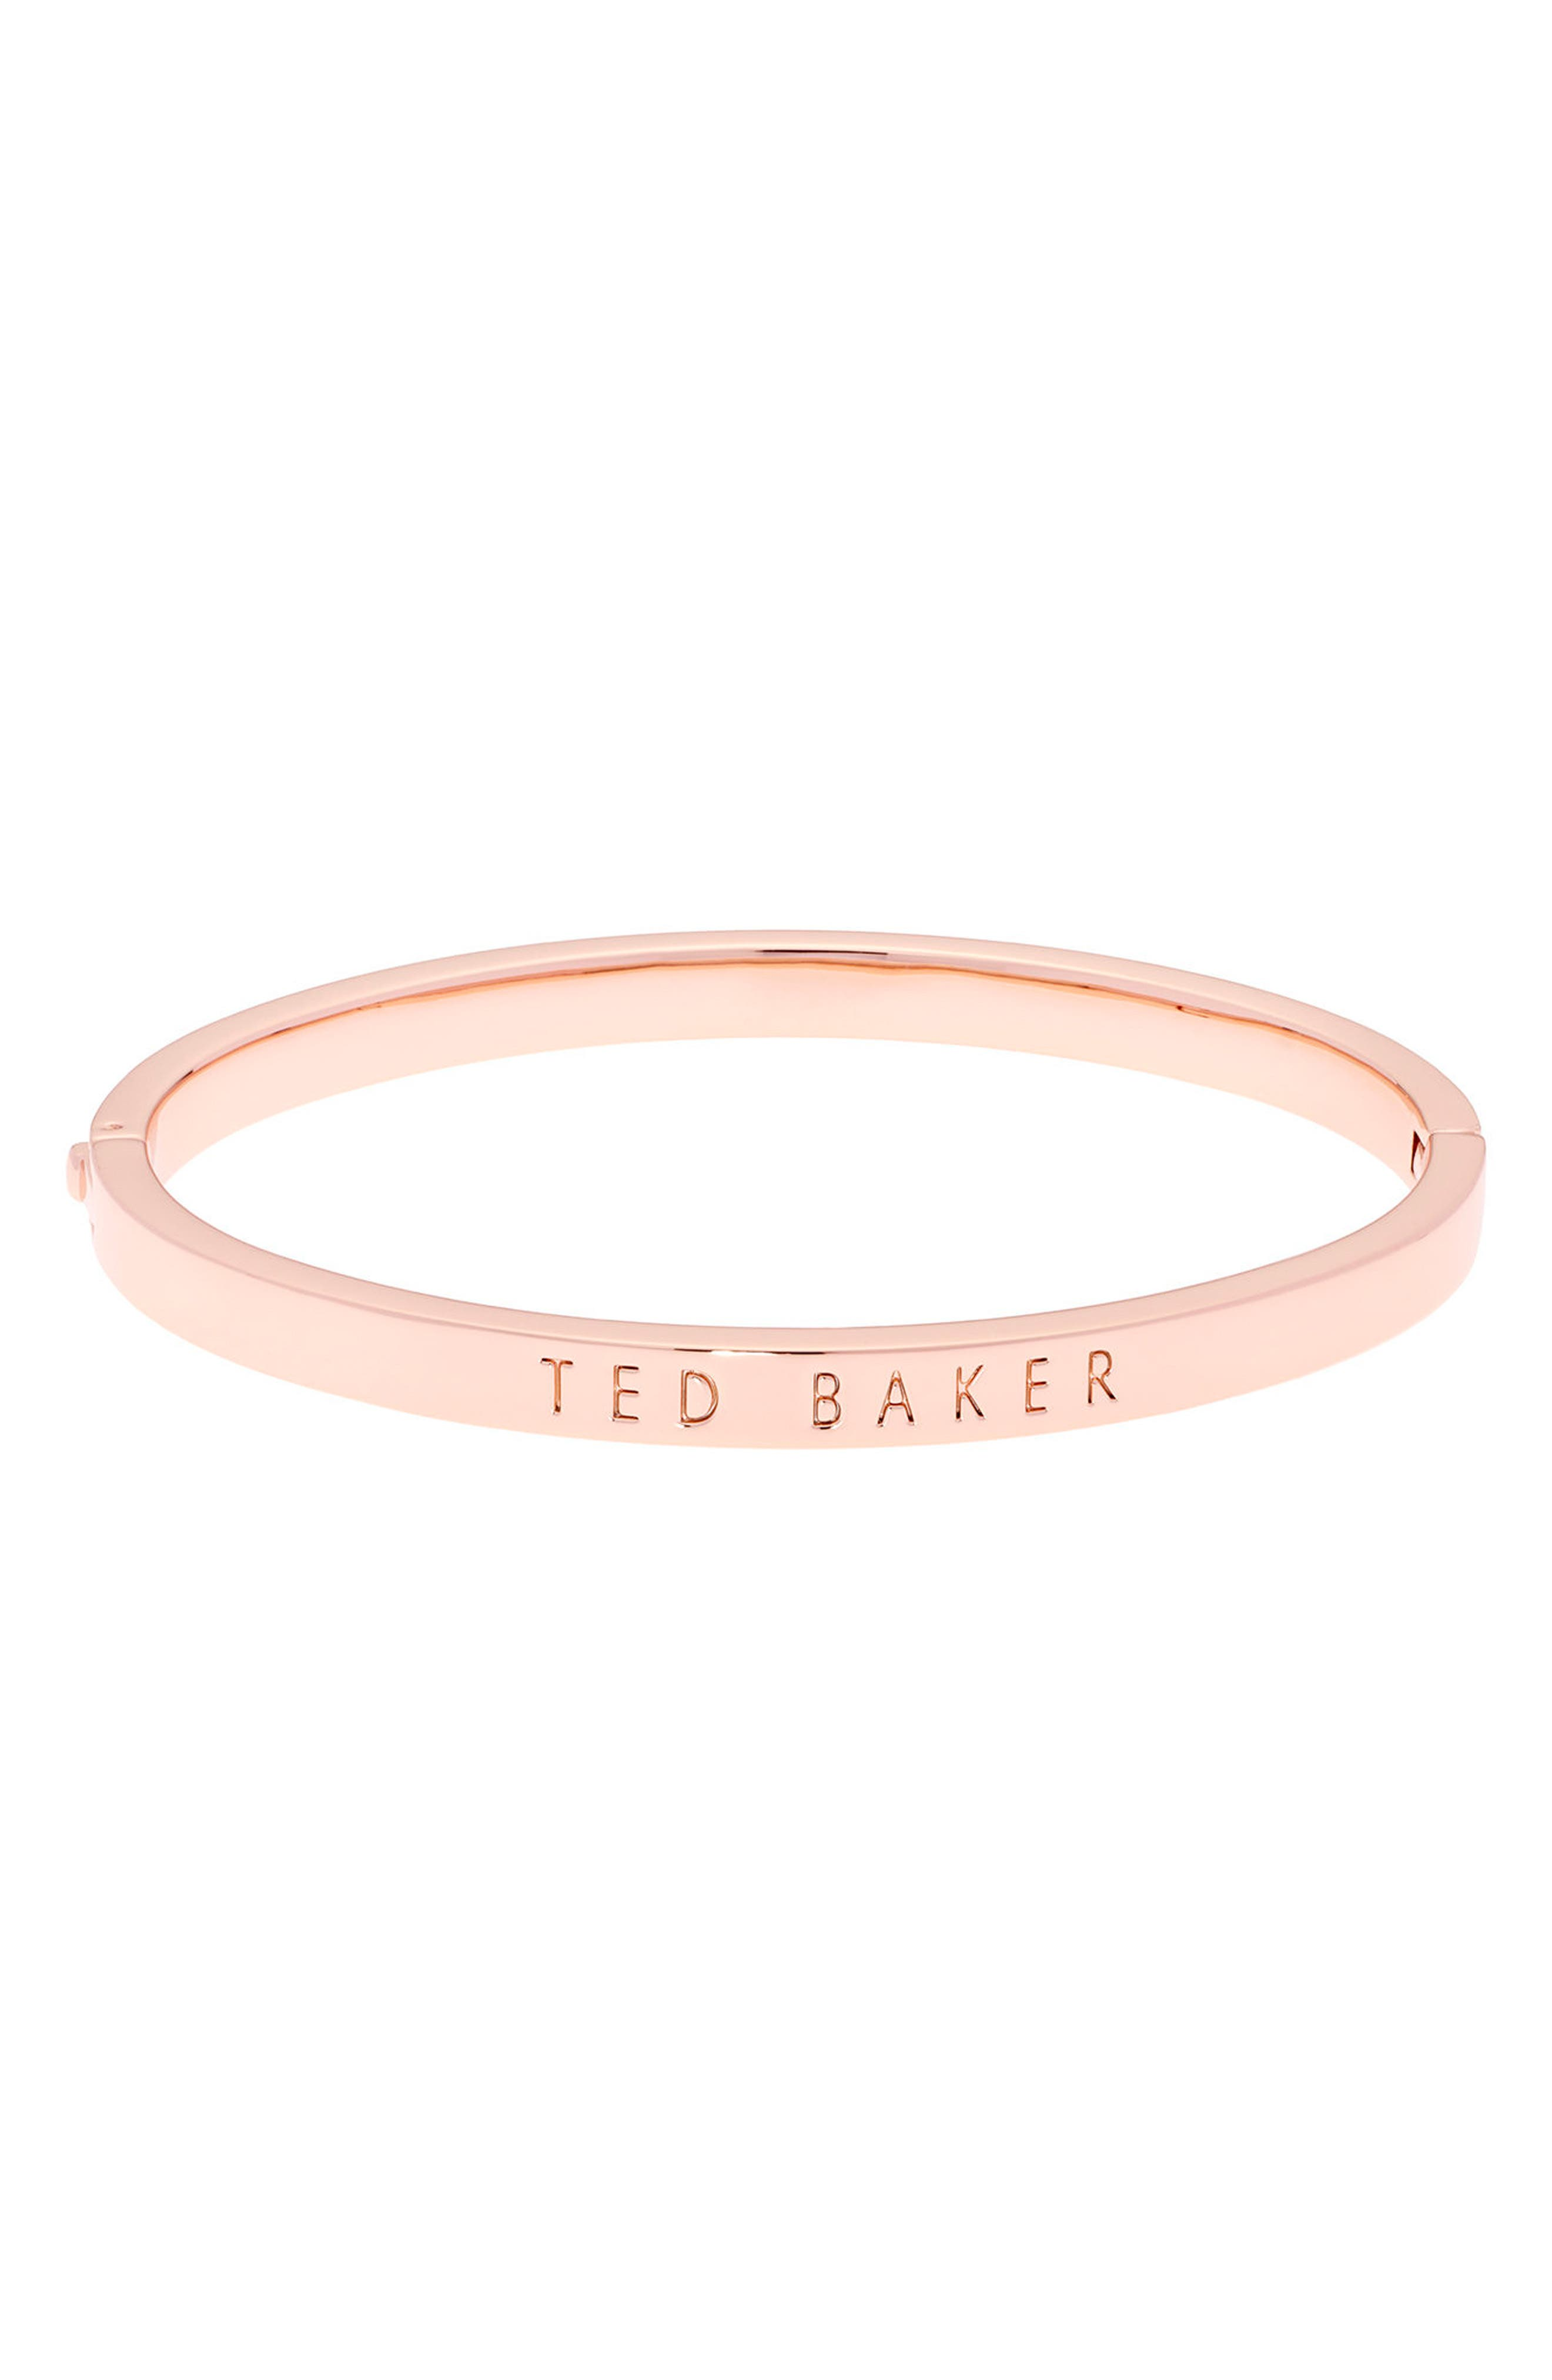 Ted Baker London Metallic Hinge Bangle Bracelet